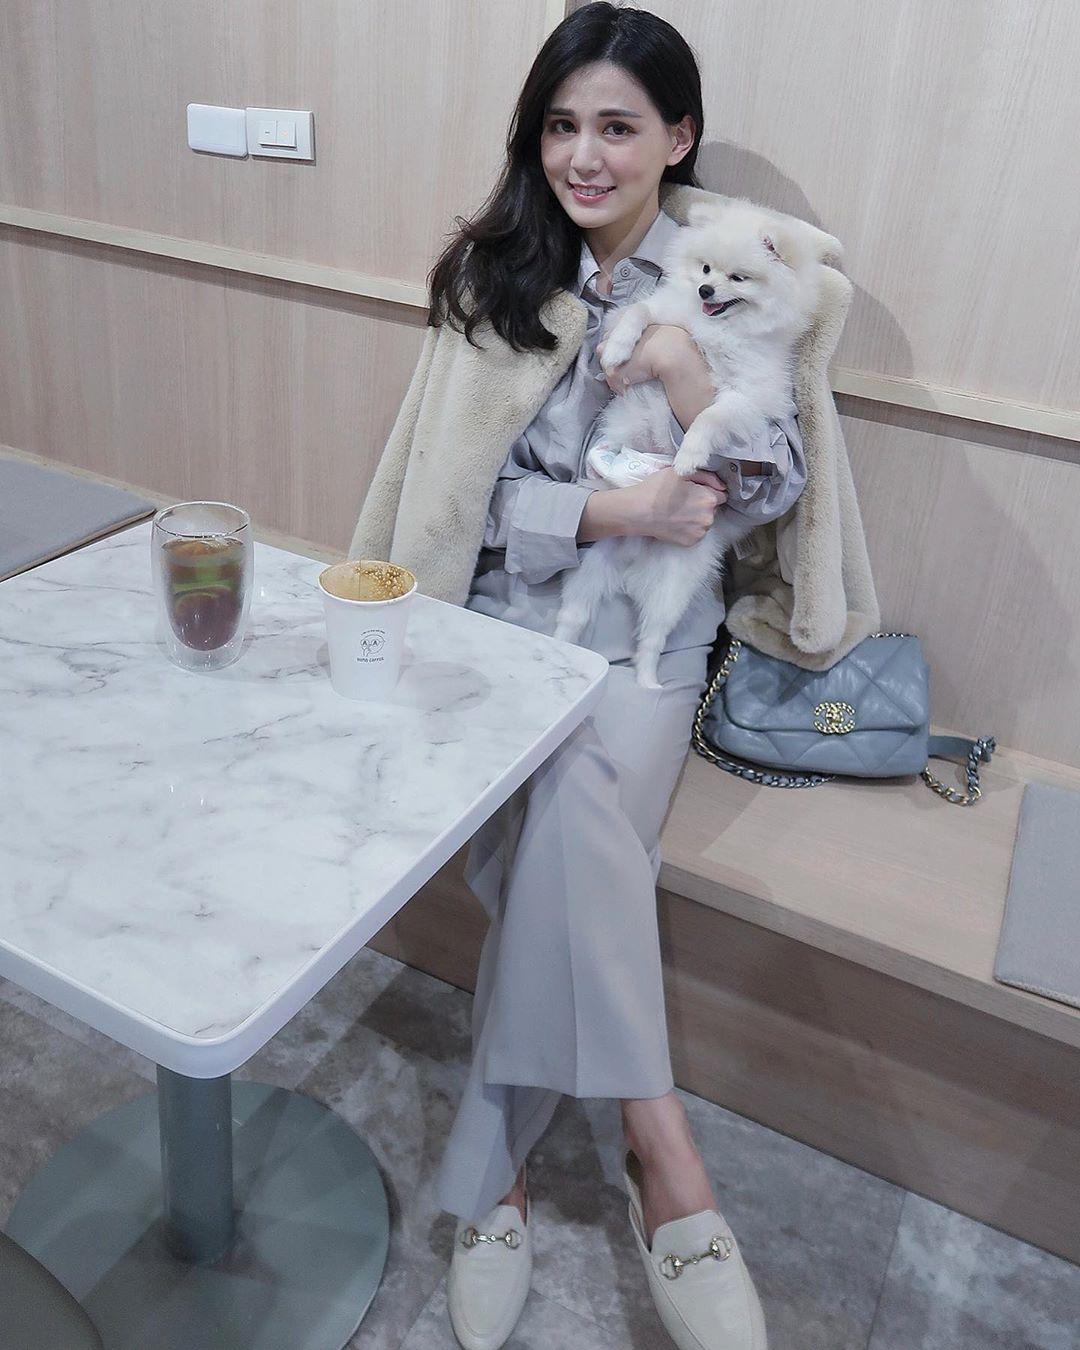 ooolin0114_s Media_ 初一帶雪寶寶喝咖啡☕️.jpg